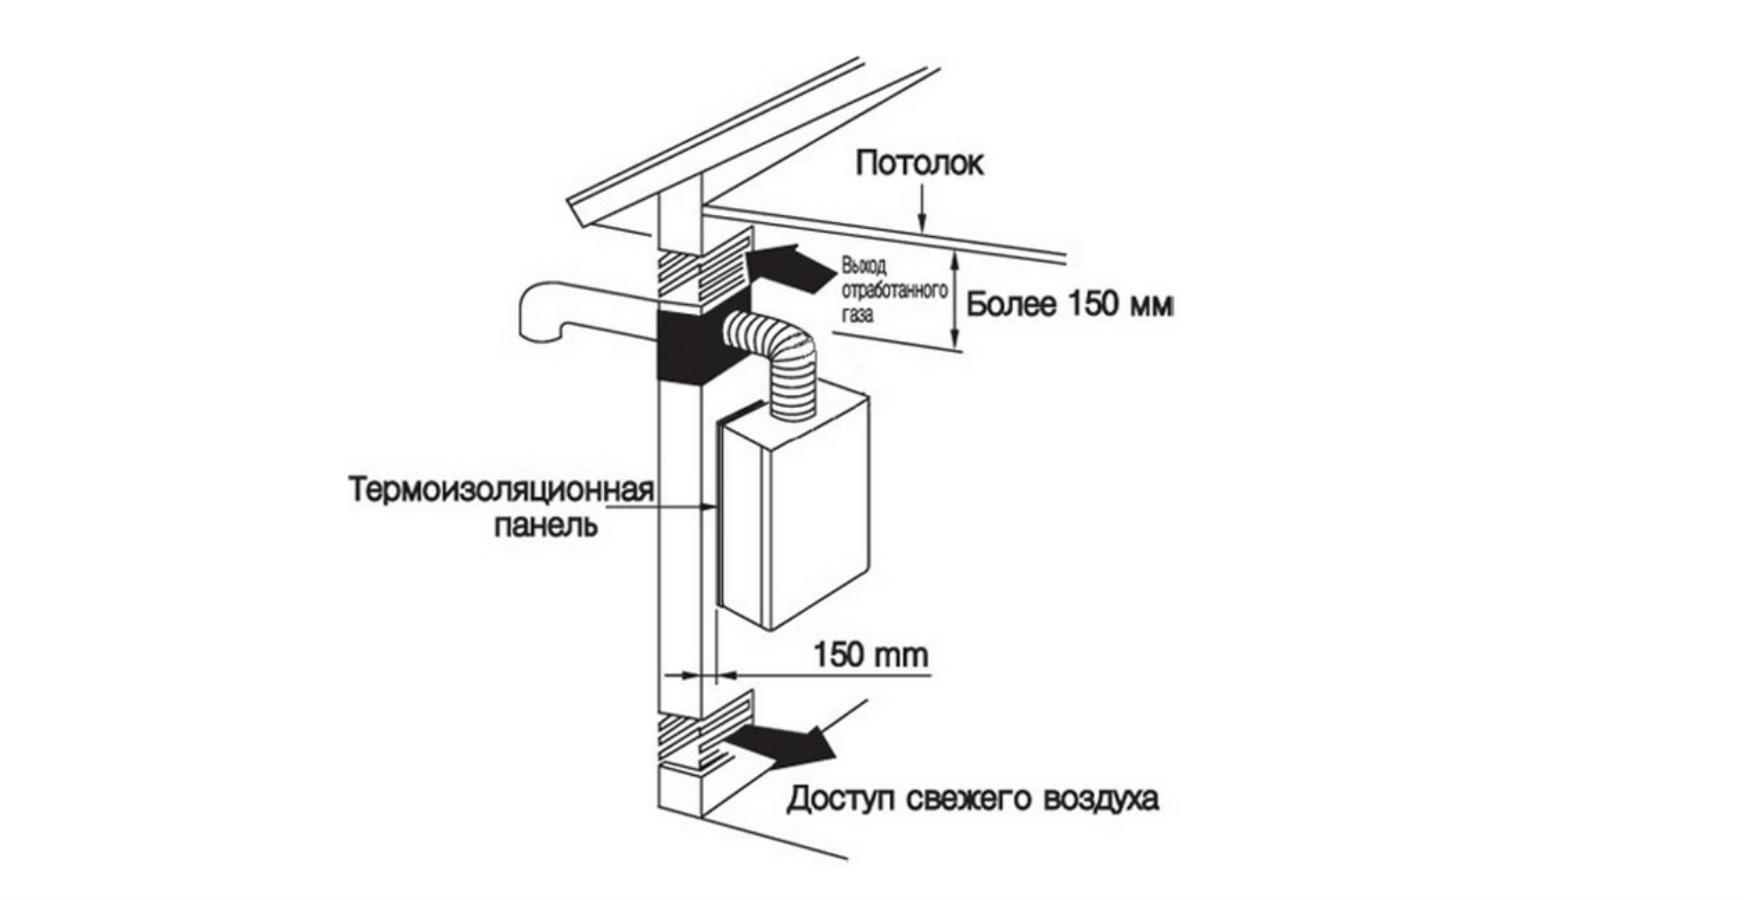 Отопление и вентиляция: видео-инструкция по монтажу своими руками, особенности систем, водоснабжения, снип, цена, фото